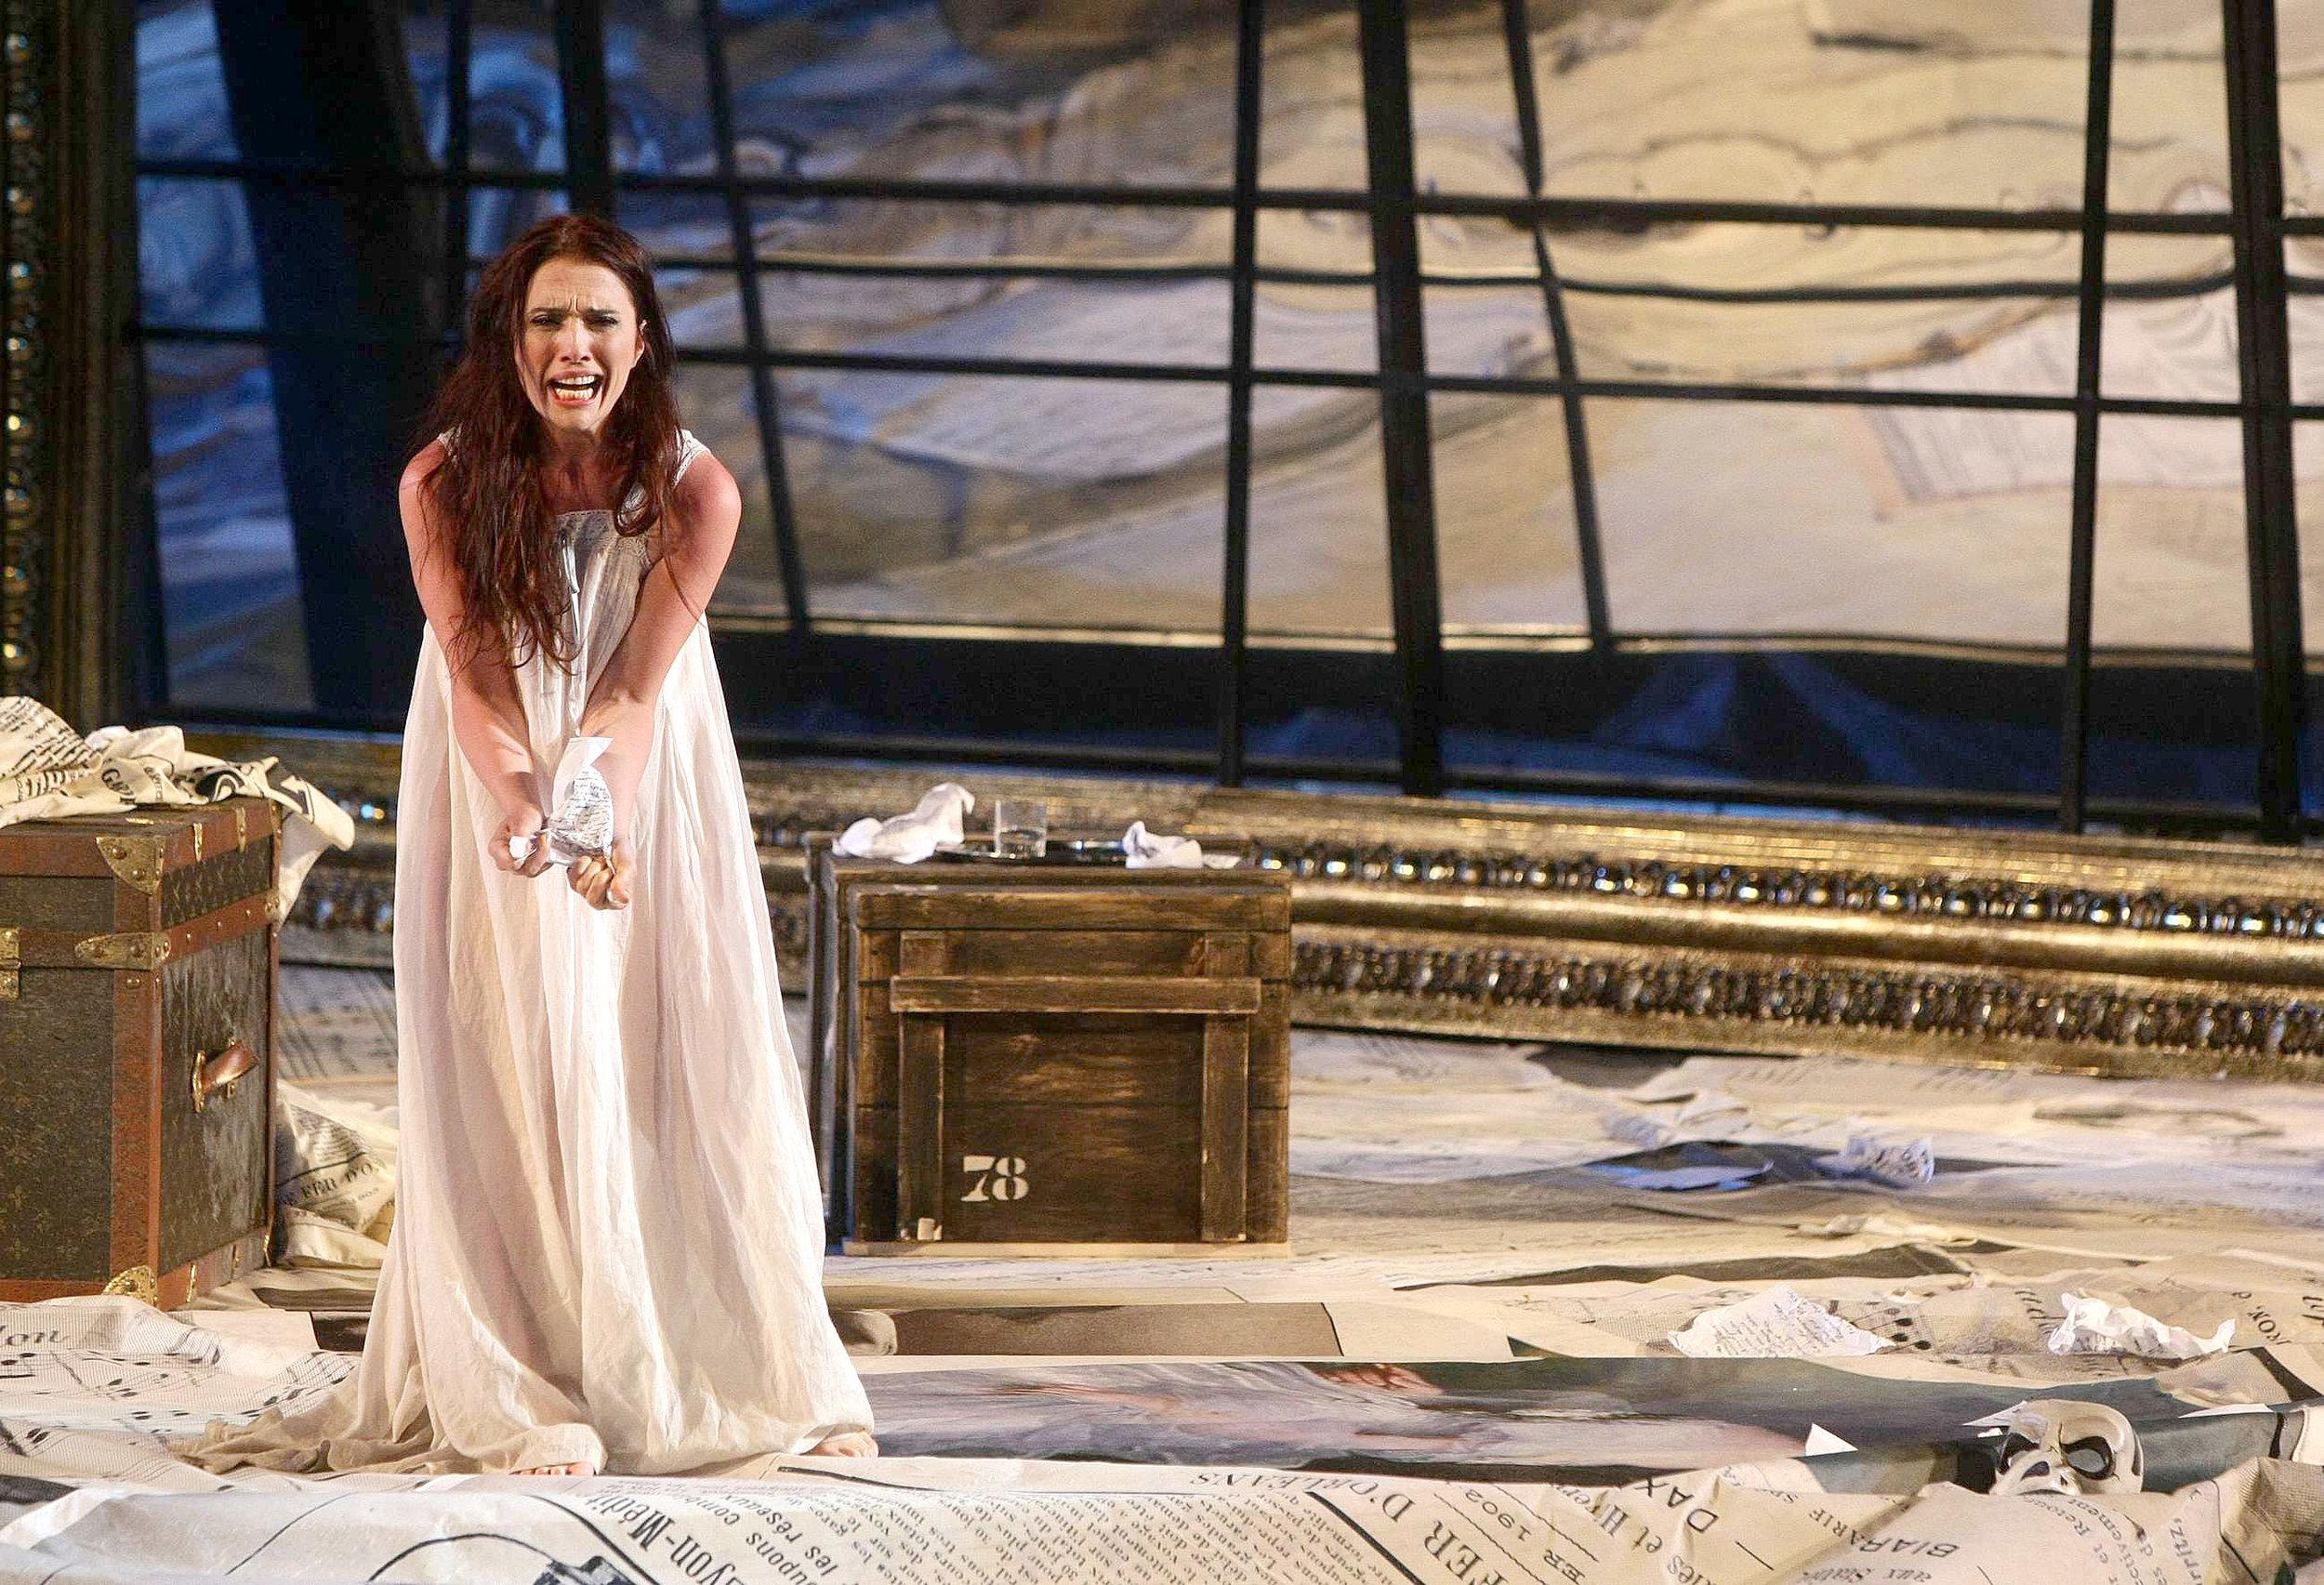 ErmonelaJaho-Traviata-Verona-Italy6.jpg